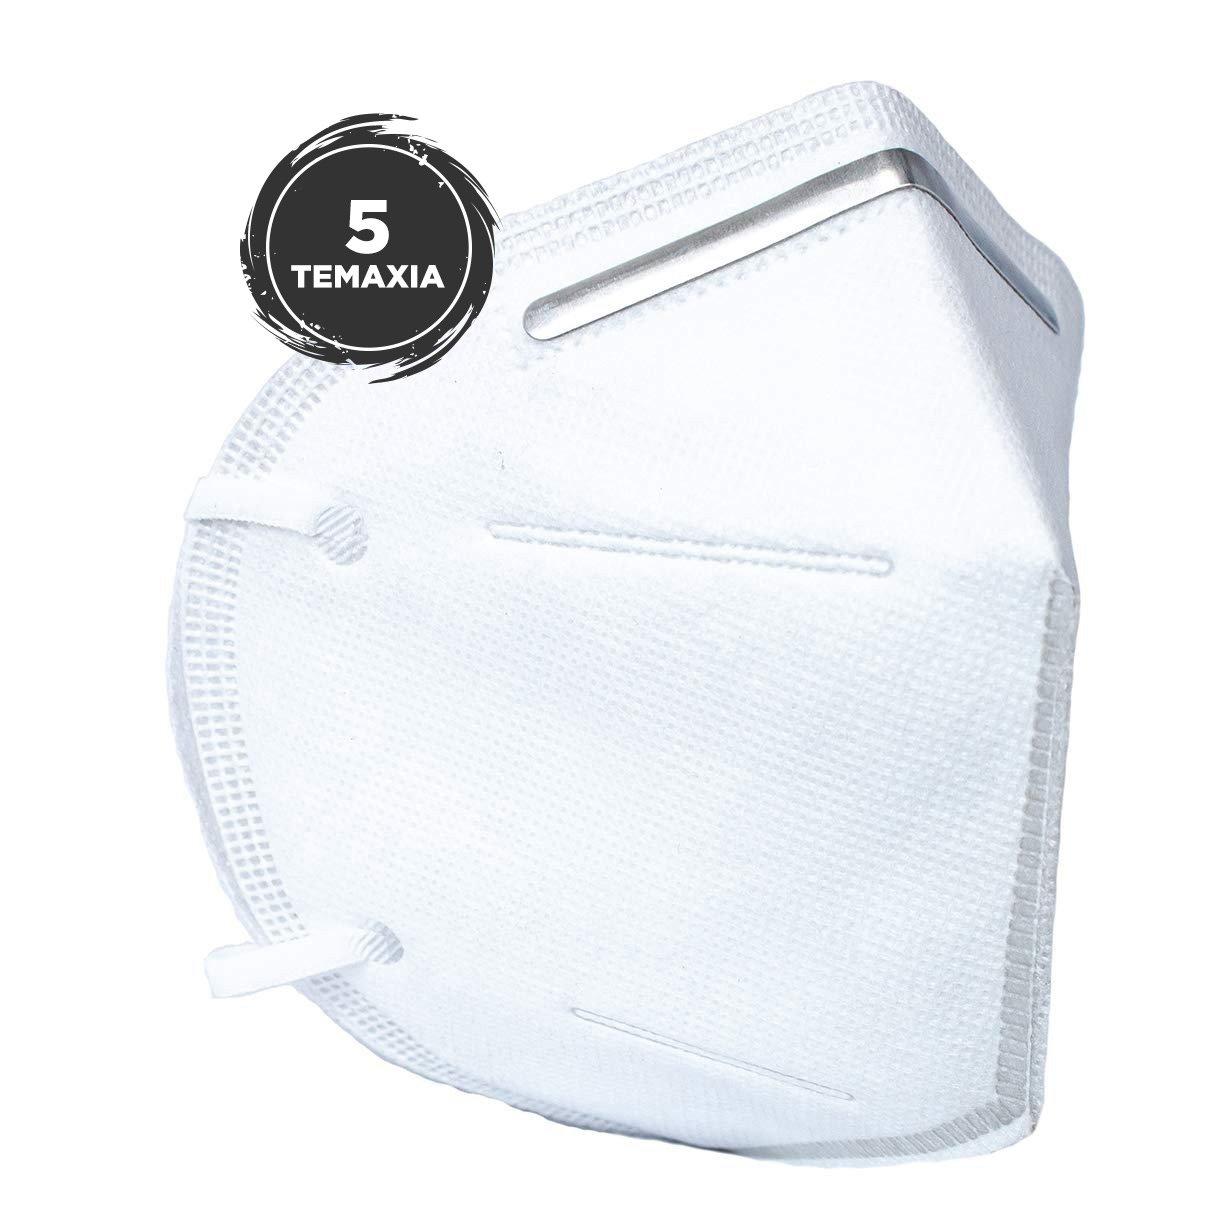 Disposable Mask For Civil Use FFP2 – KN95 Μάσκα Προστασίας με Μεταλλικό Έλασμα Μίας Χρήσης 5 Τεμάχια